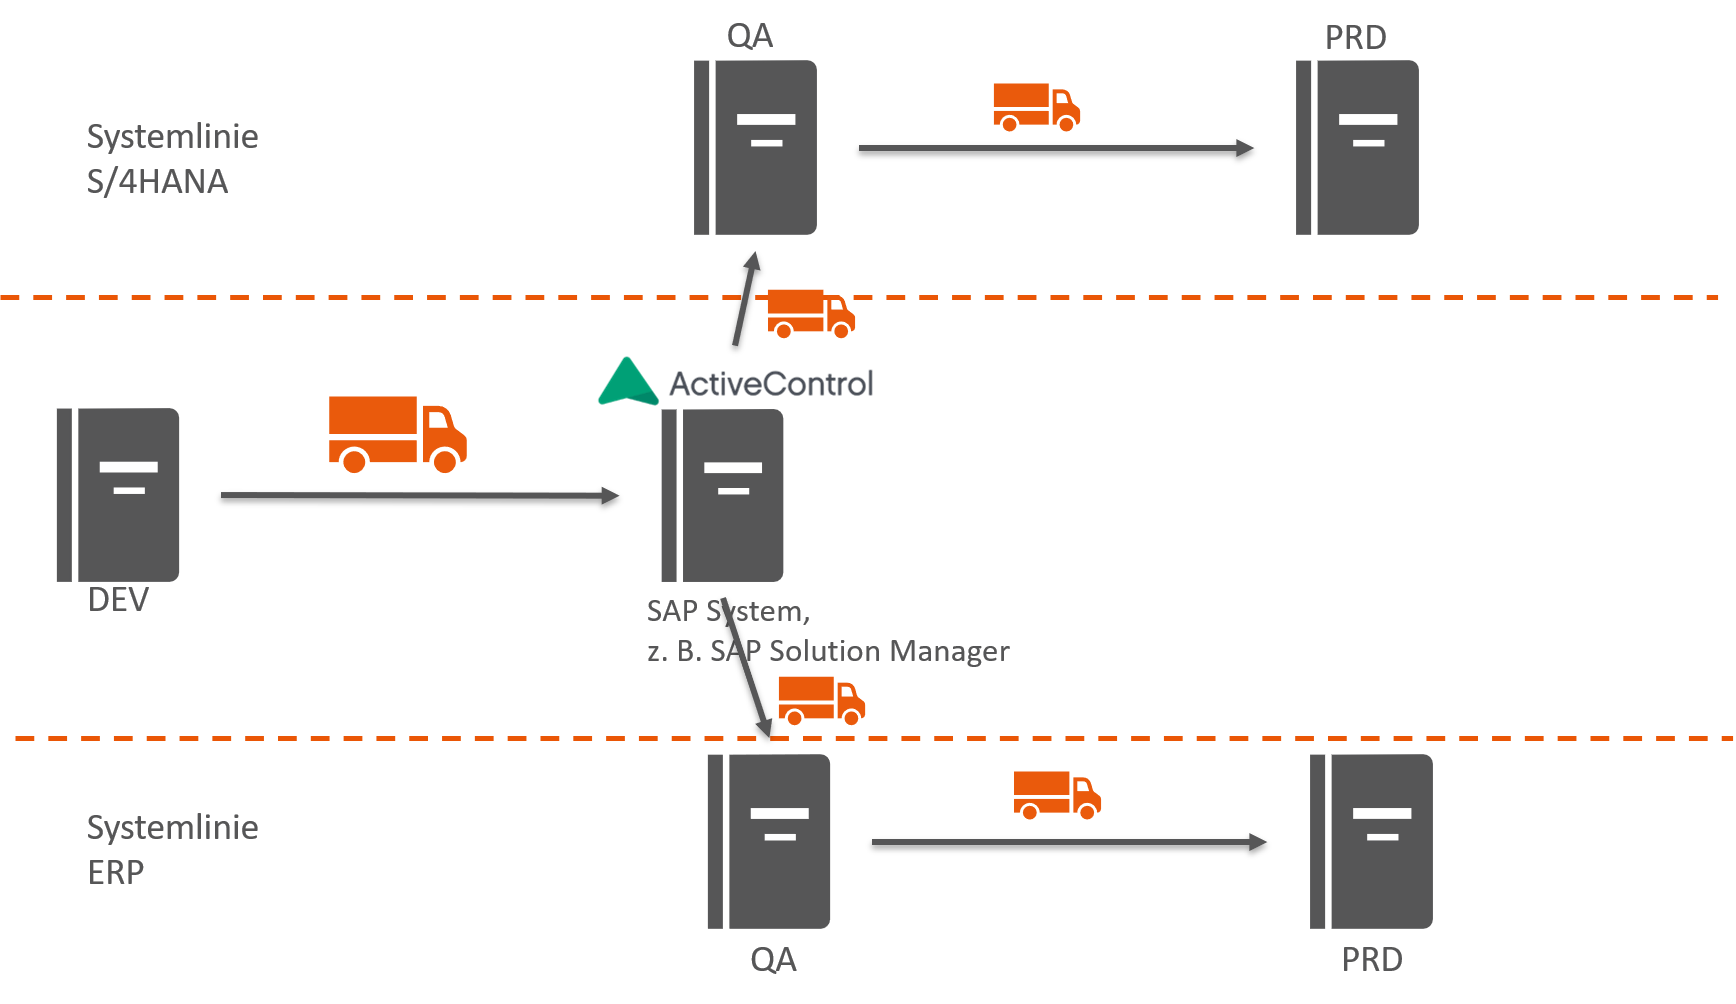 SAP-Releasemanagement mit ActiveControl